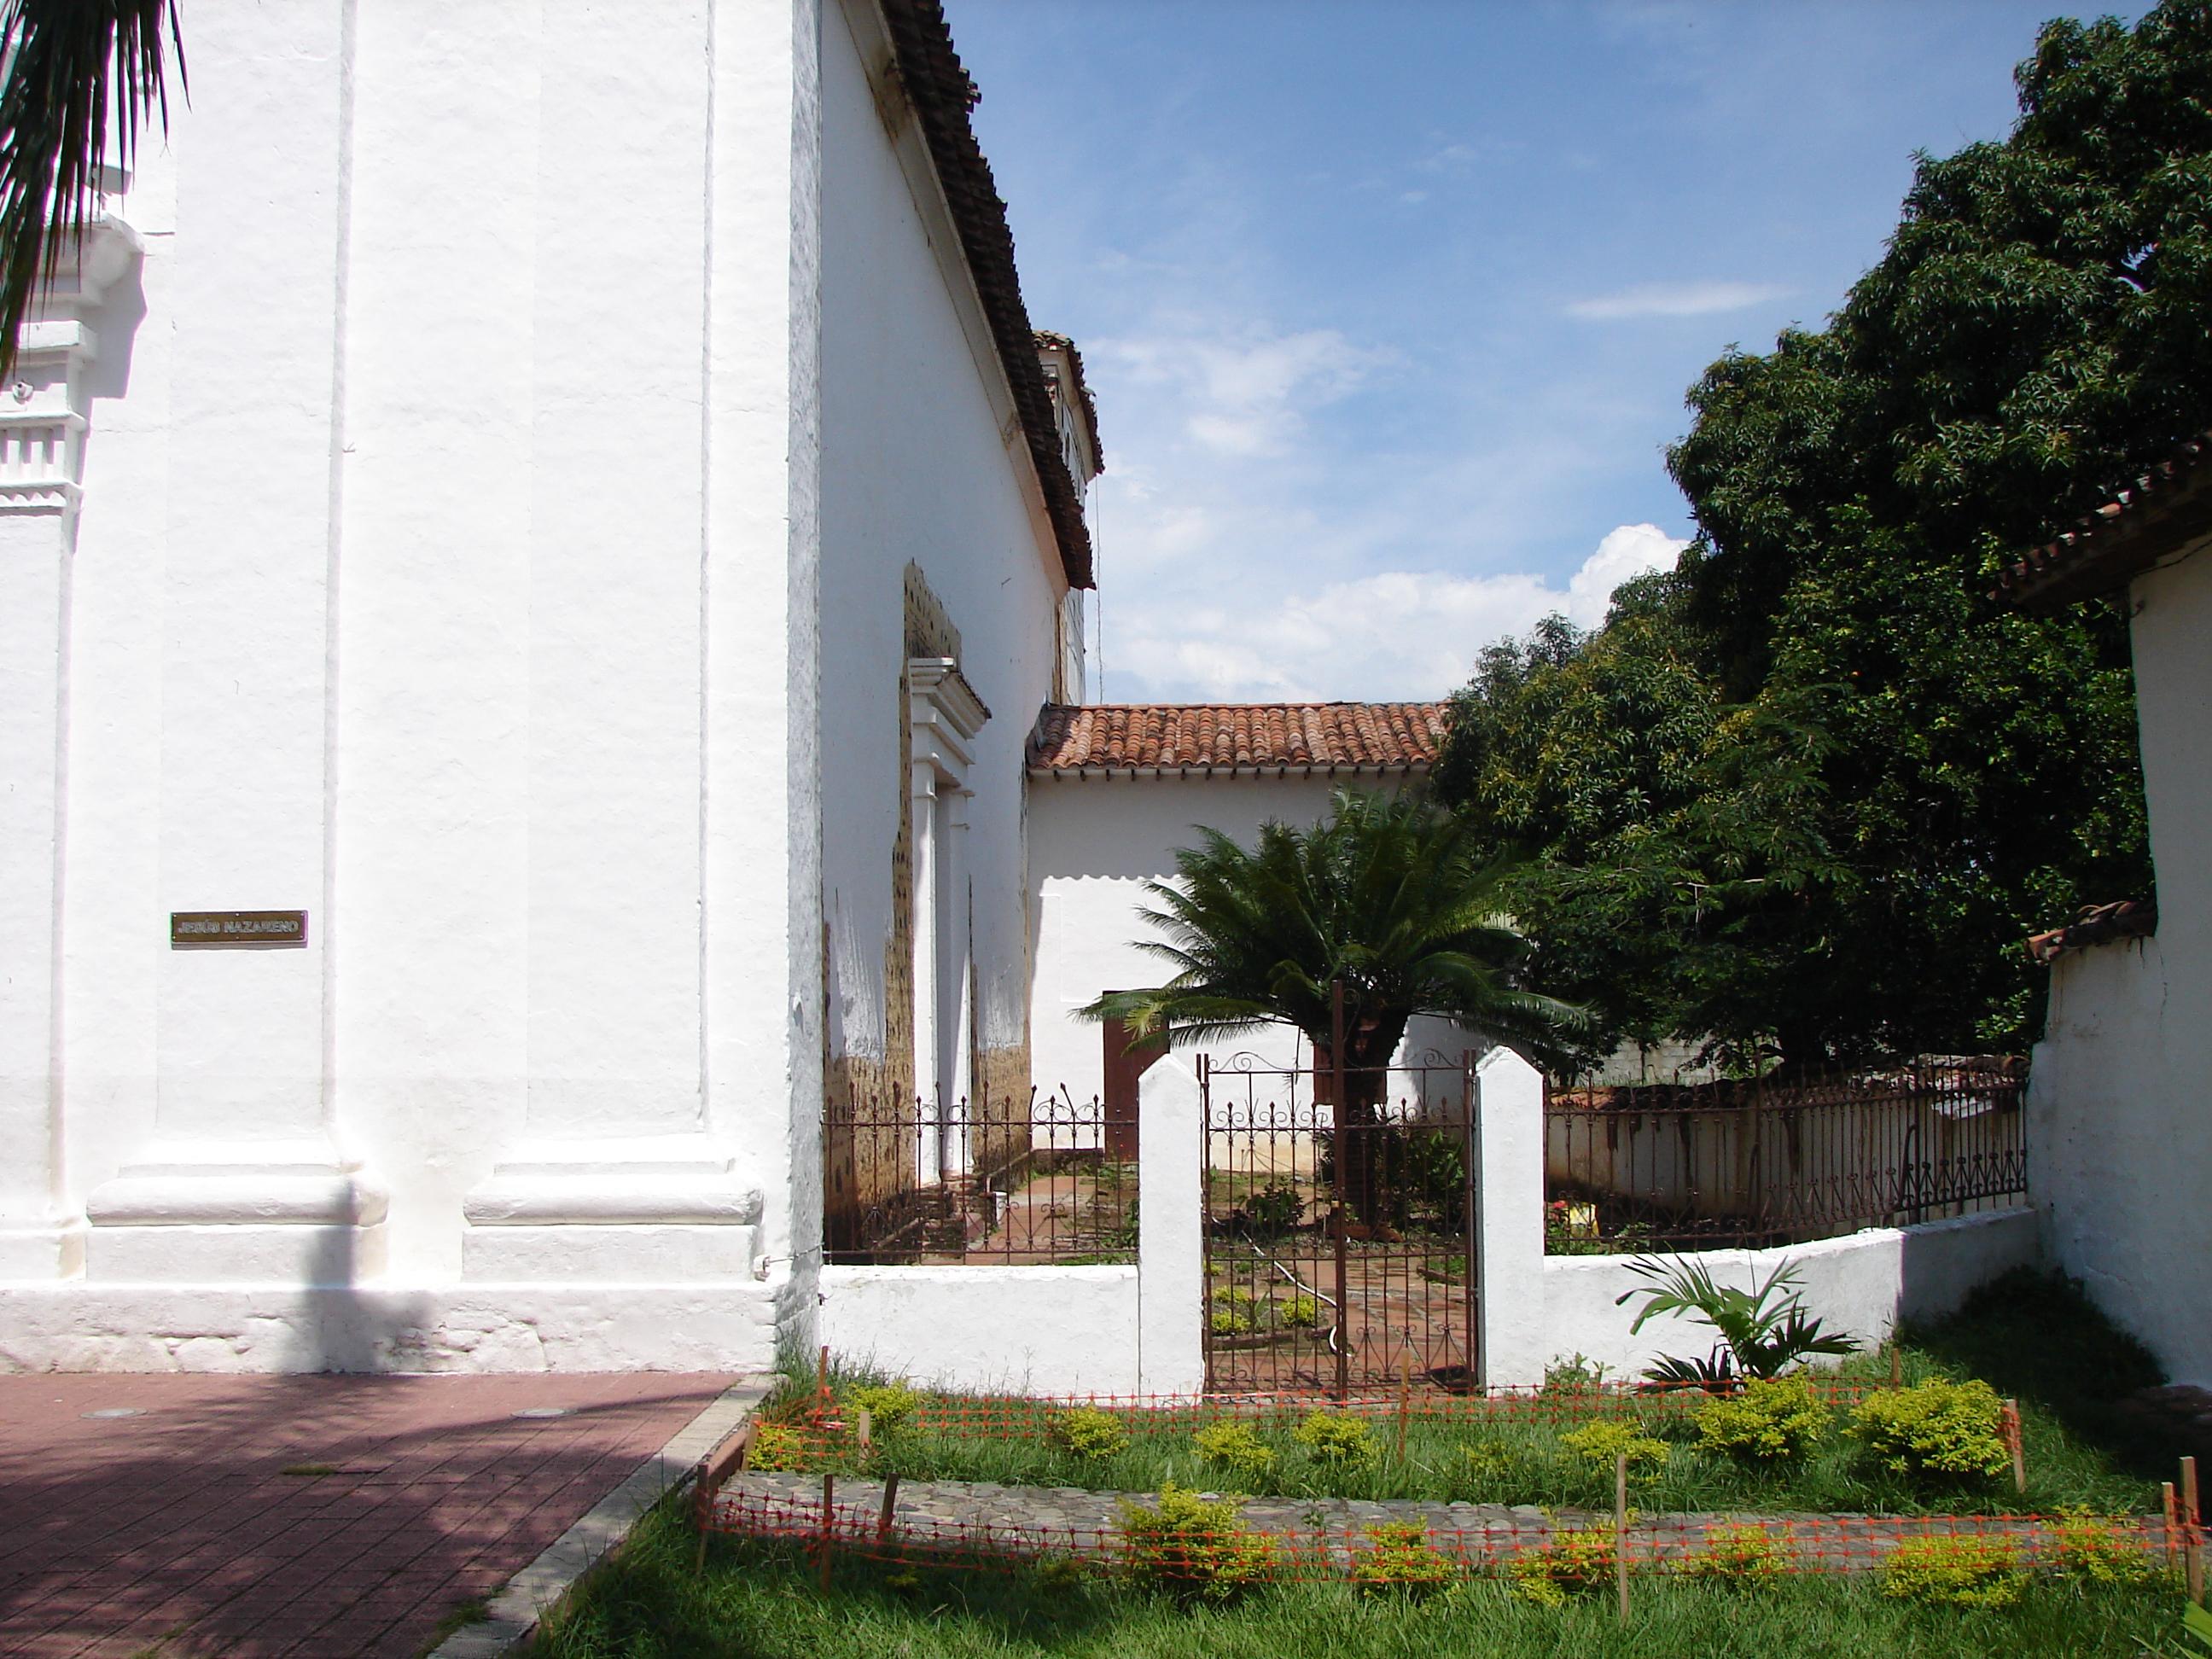 File Patio iglesita Santa Fe de Antioquia antioquia Colombia